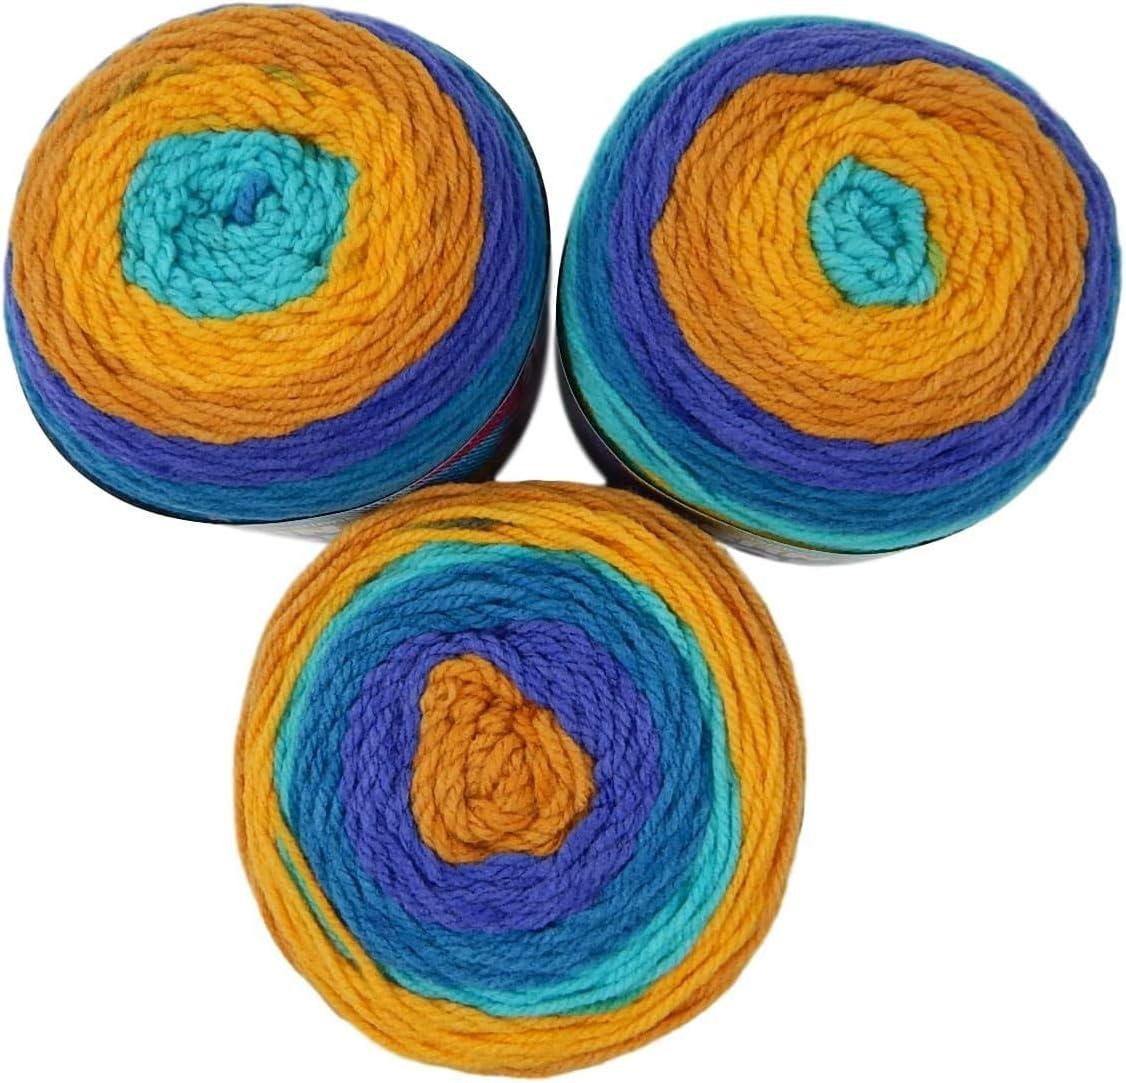 Acrilico 20 x 6 x 6 inches Gold Rush River Bernat Pop-Pack of 3 BALLS-140G Each Ball